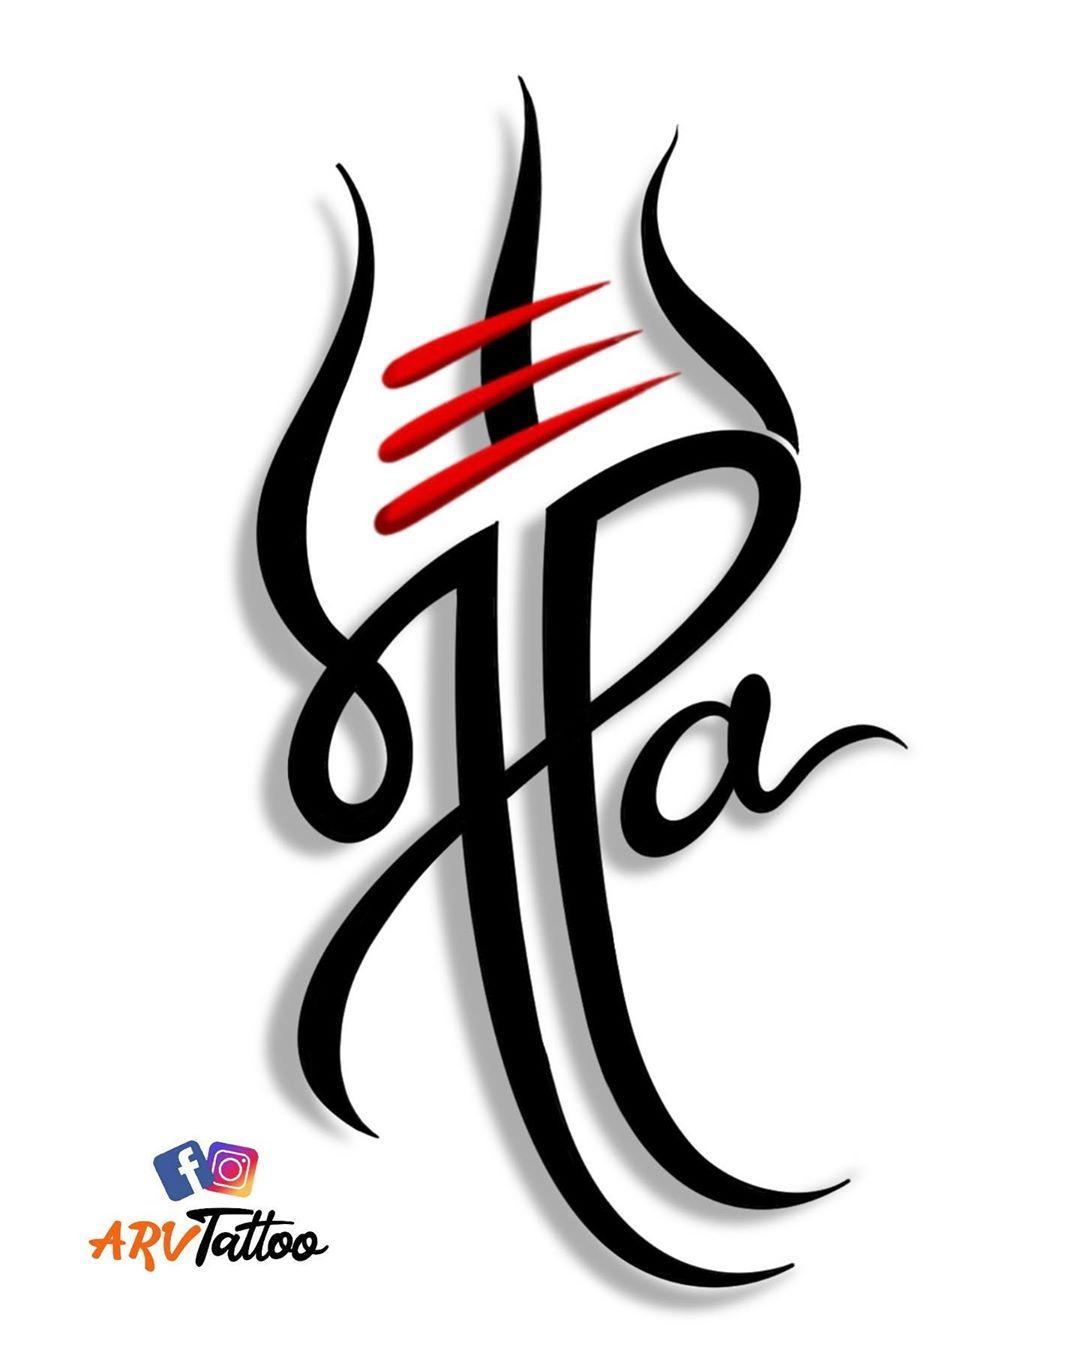 Maa Maatattoo Maapaa Maapaatattoo Shiva Maapaashivatrishul Maapaatattoodesign Arvtattoo In 2020 Mom Tattoo Designs Mom Dad Tattoo Designs Maa Tattoo Designs